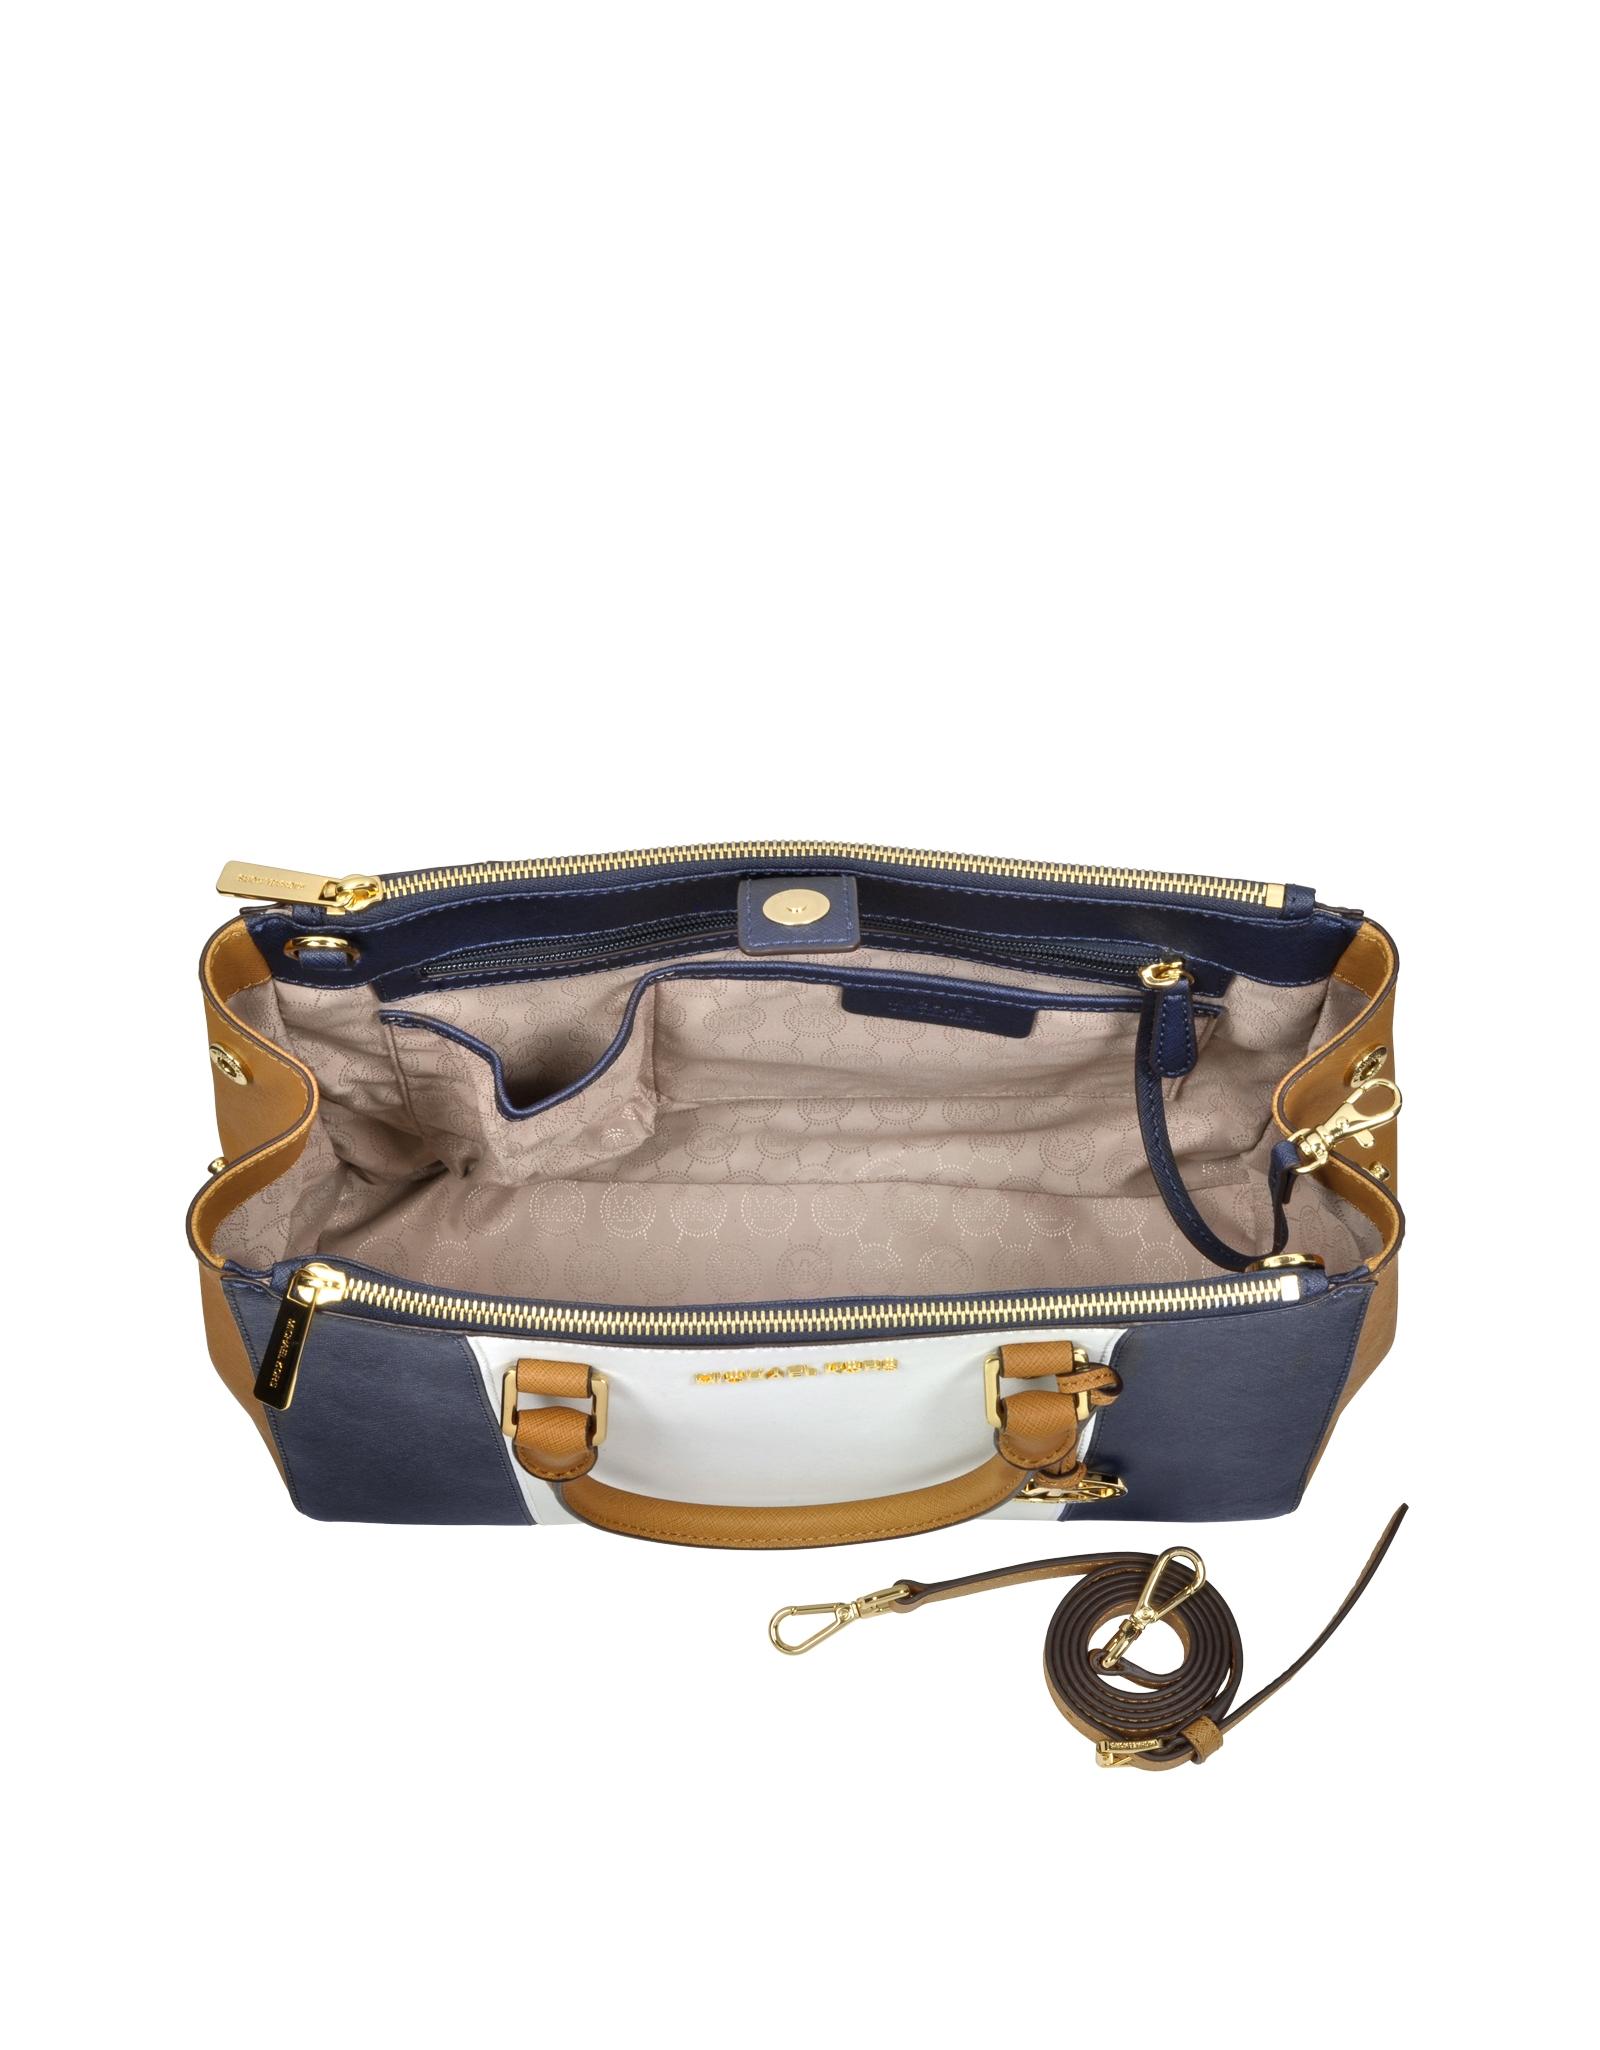 c5df518892fc02 Michael Kors Sutton Large Color-Block Leather Satchel in Brown - Lyst